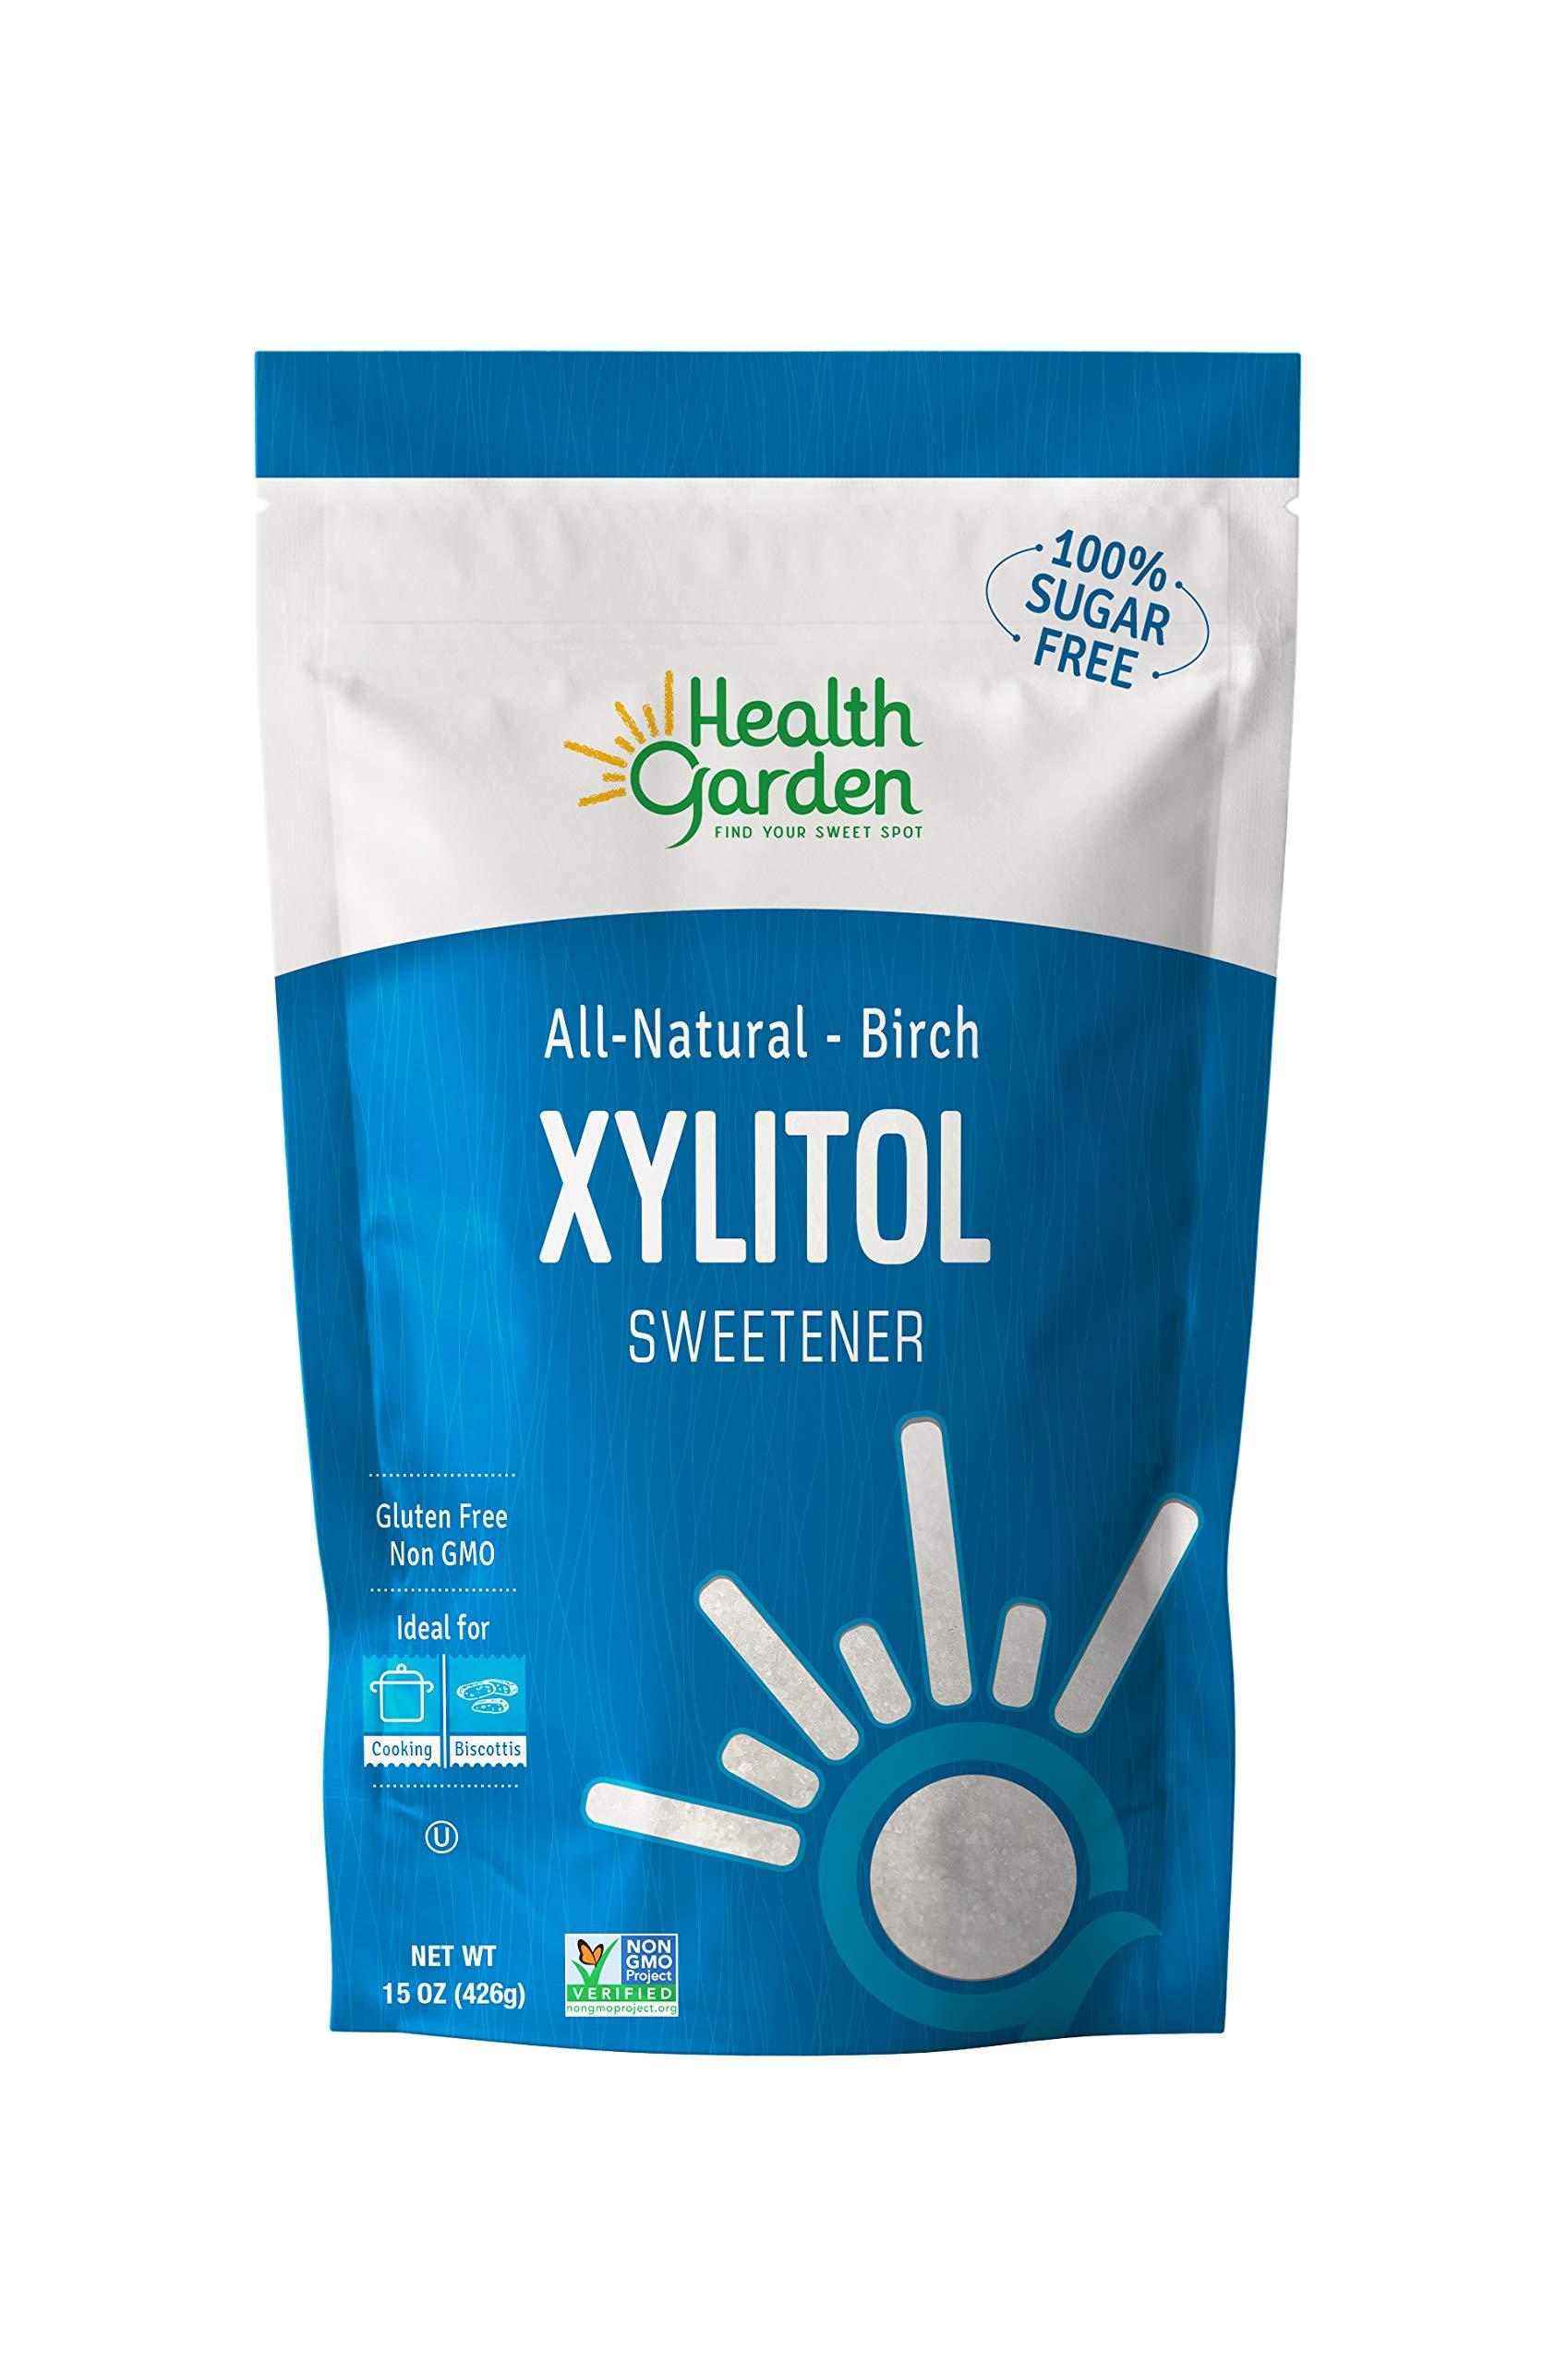 Birch Xylitol Sugar Free Sweetener - 100% All Natural, Non GMO, Health Garden Great for KETO diet 15 OZ by HEALTH GARDEN (Image #1)